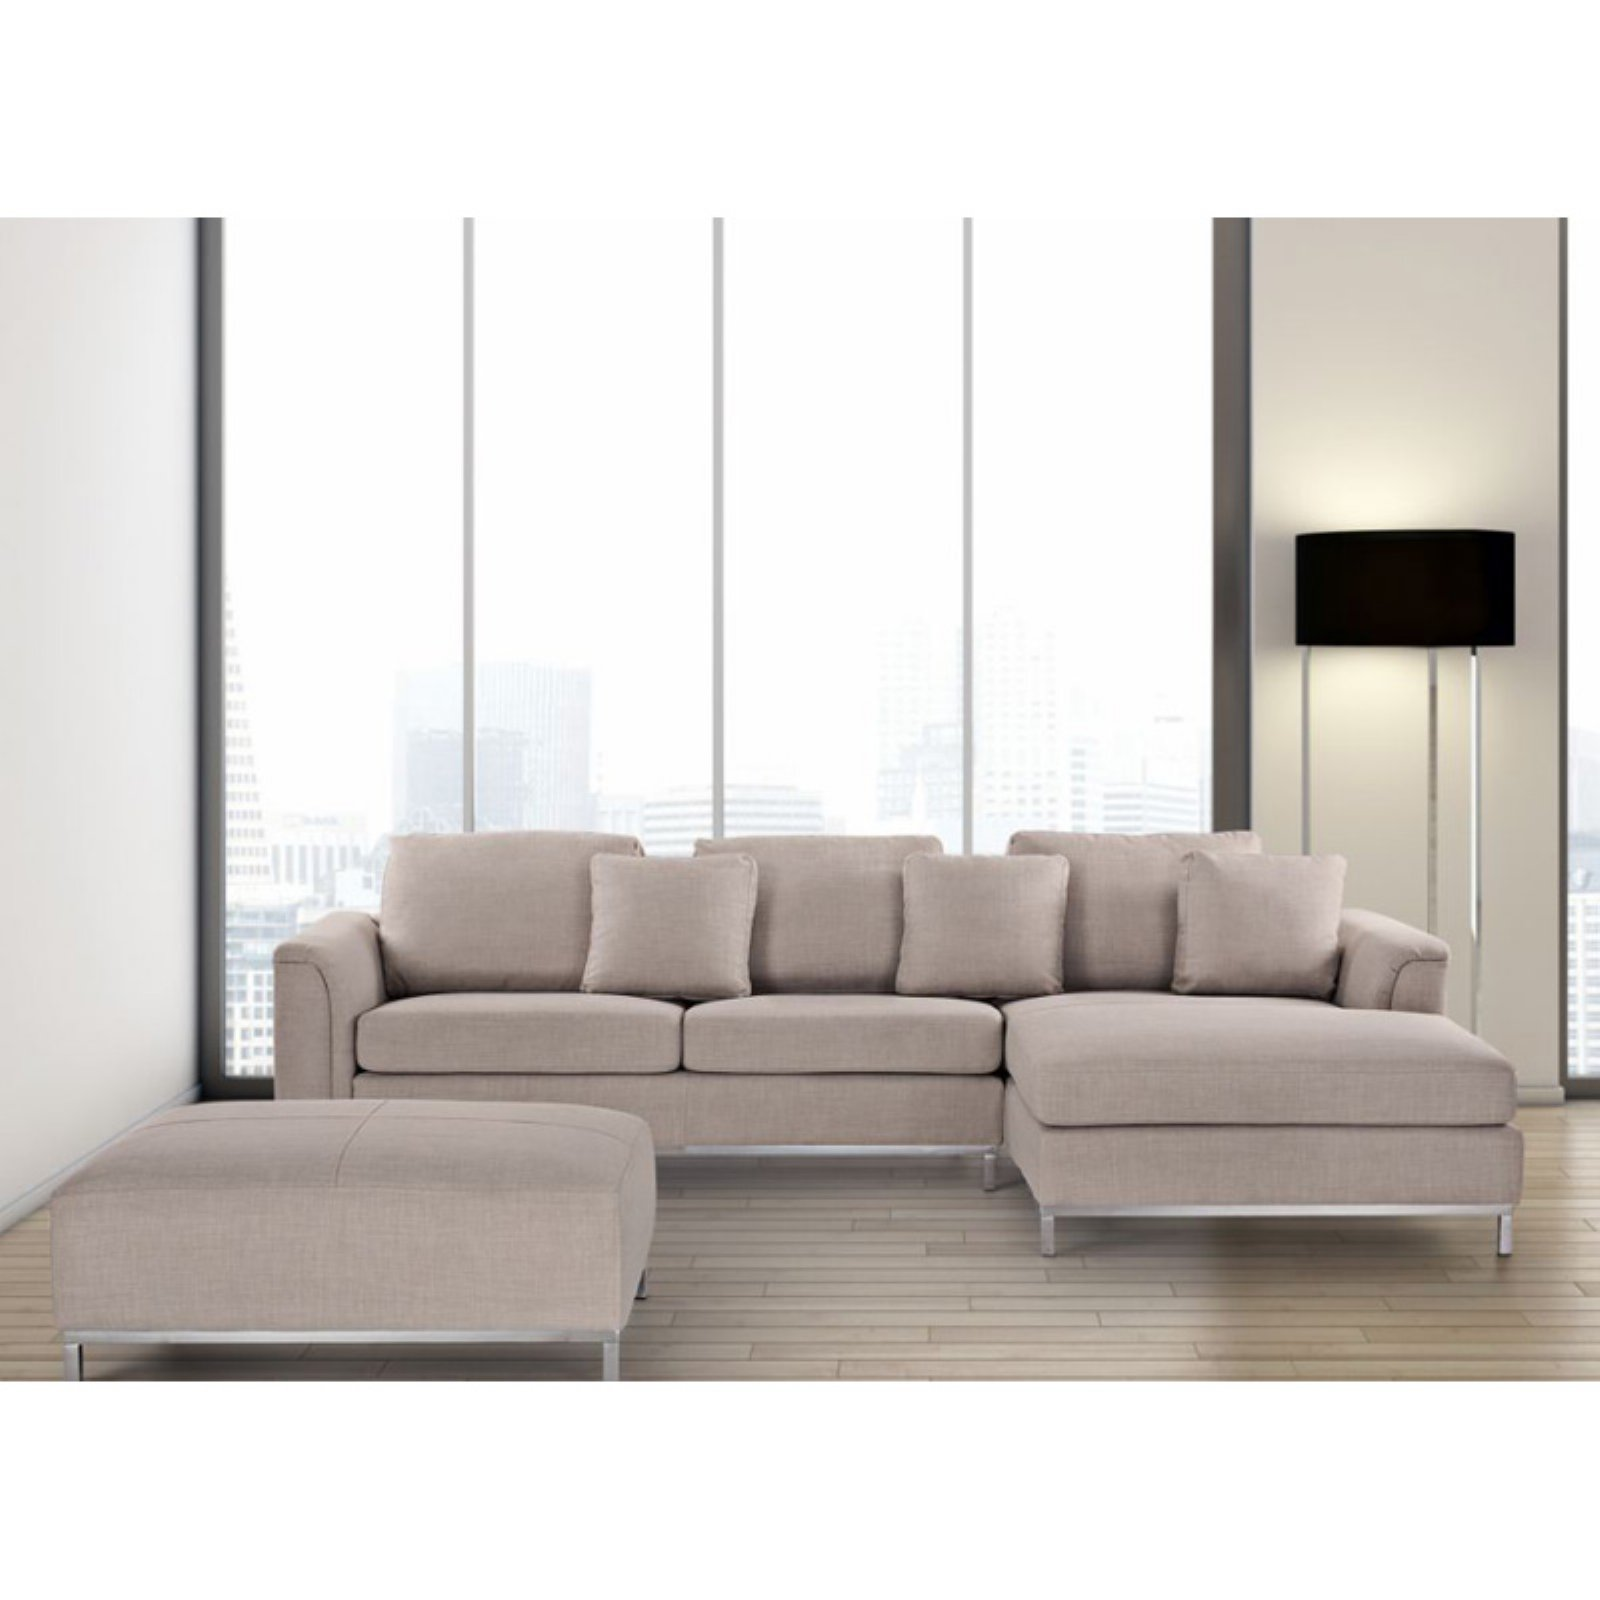 Velago Oslo Modern Fabric Sectional Sofa with Ottoman